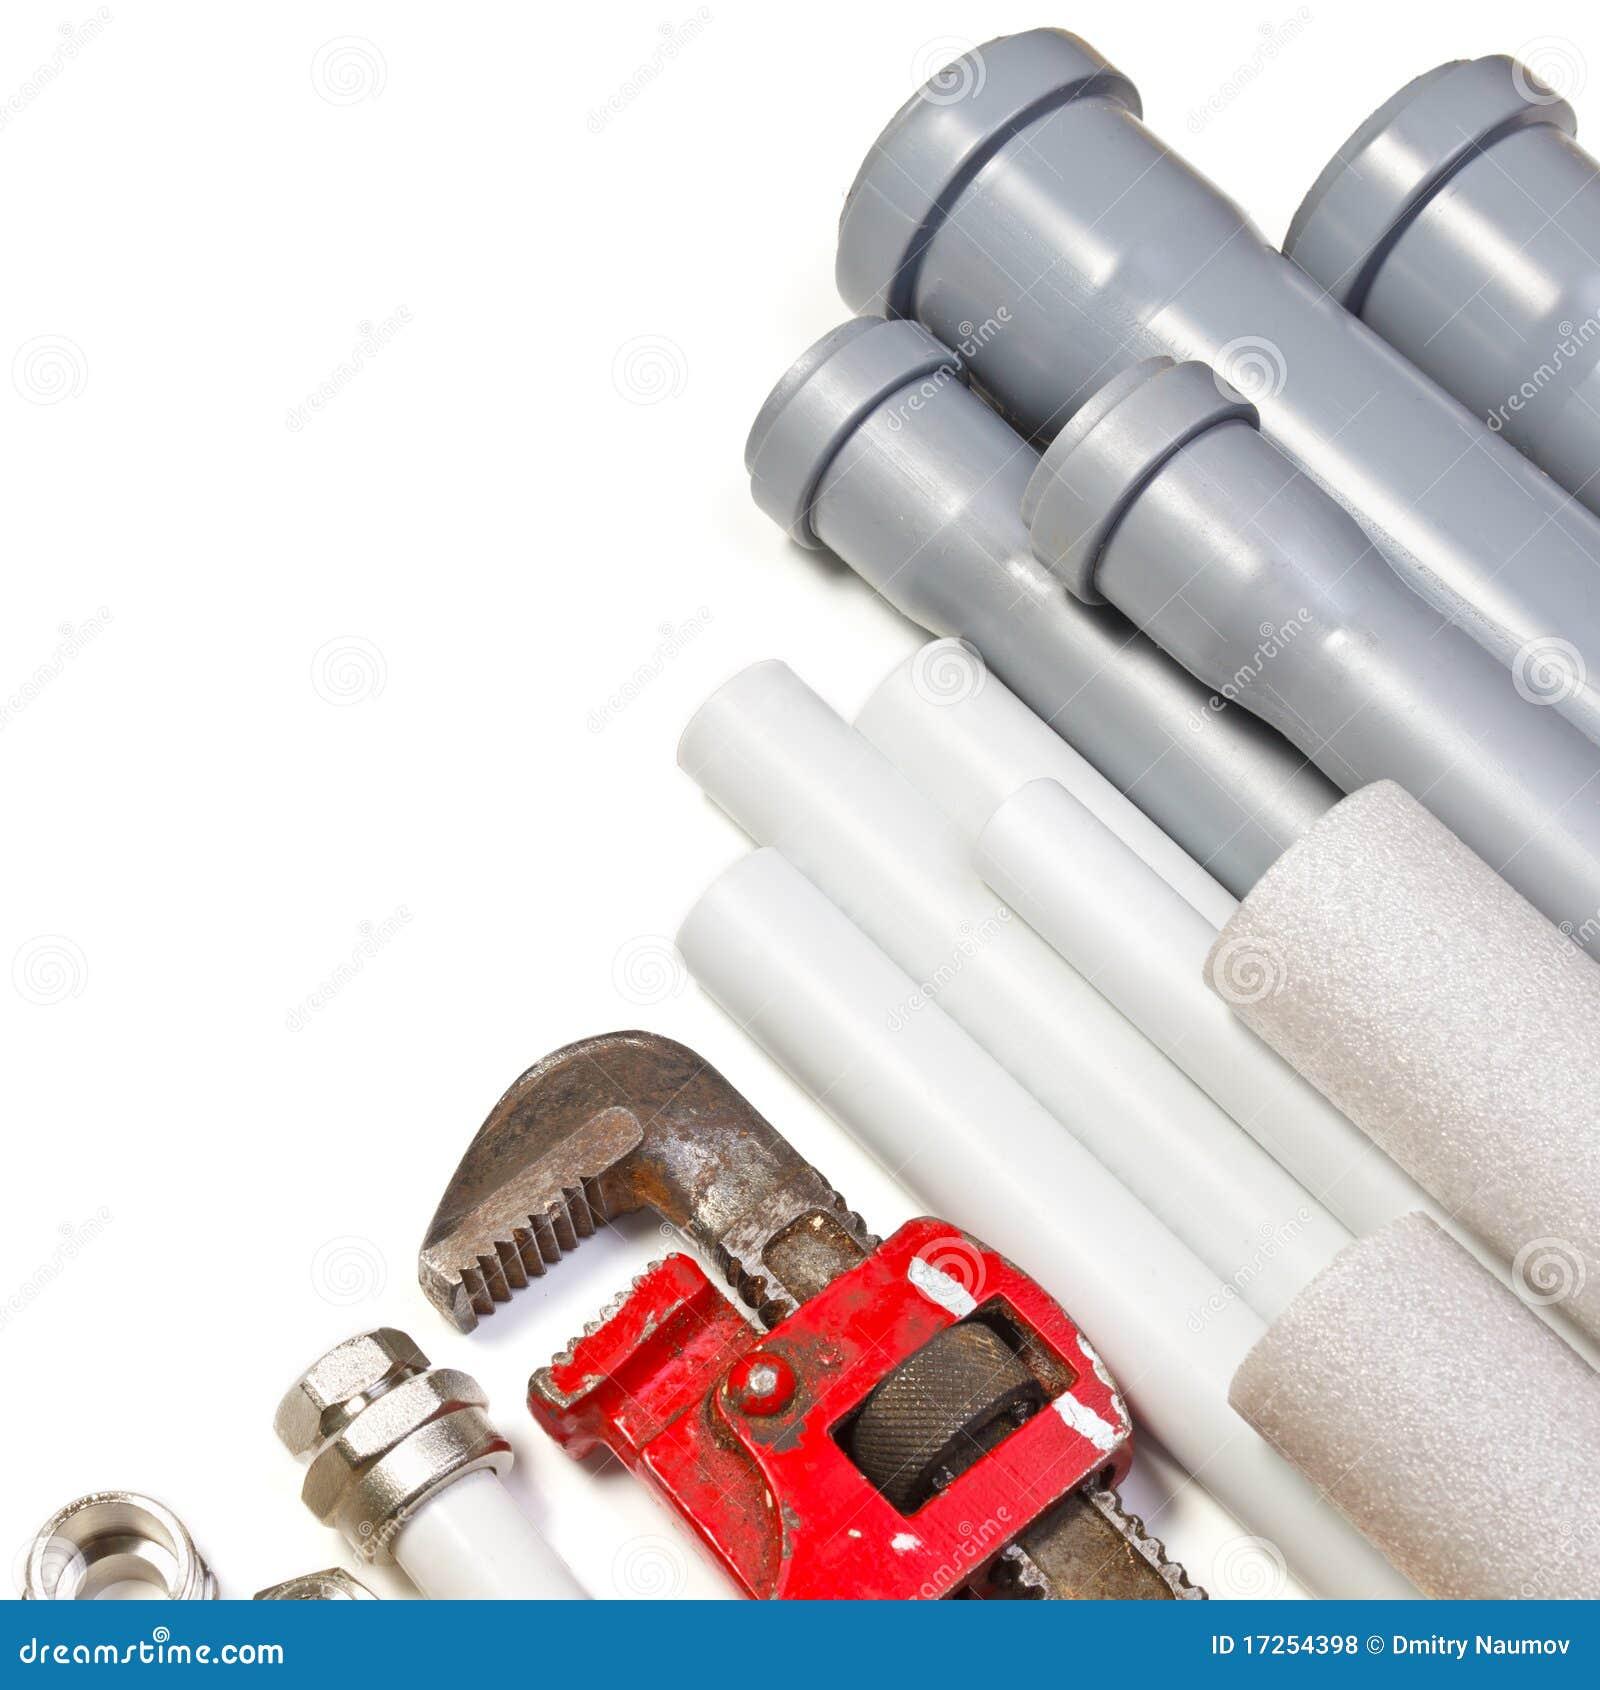 Plumbing Supplies Royalty Free Stock Photos - Image: 17254398